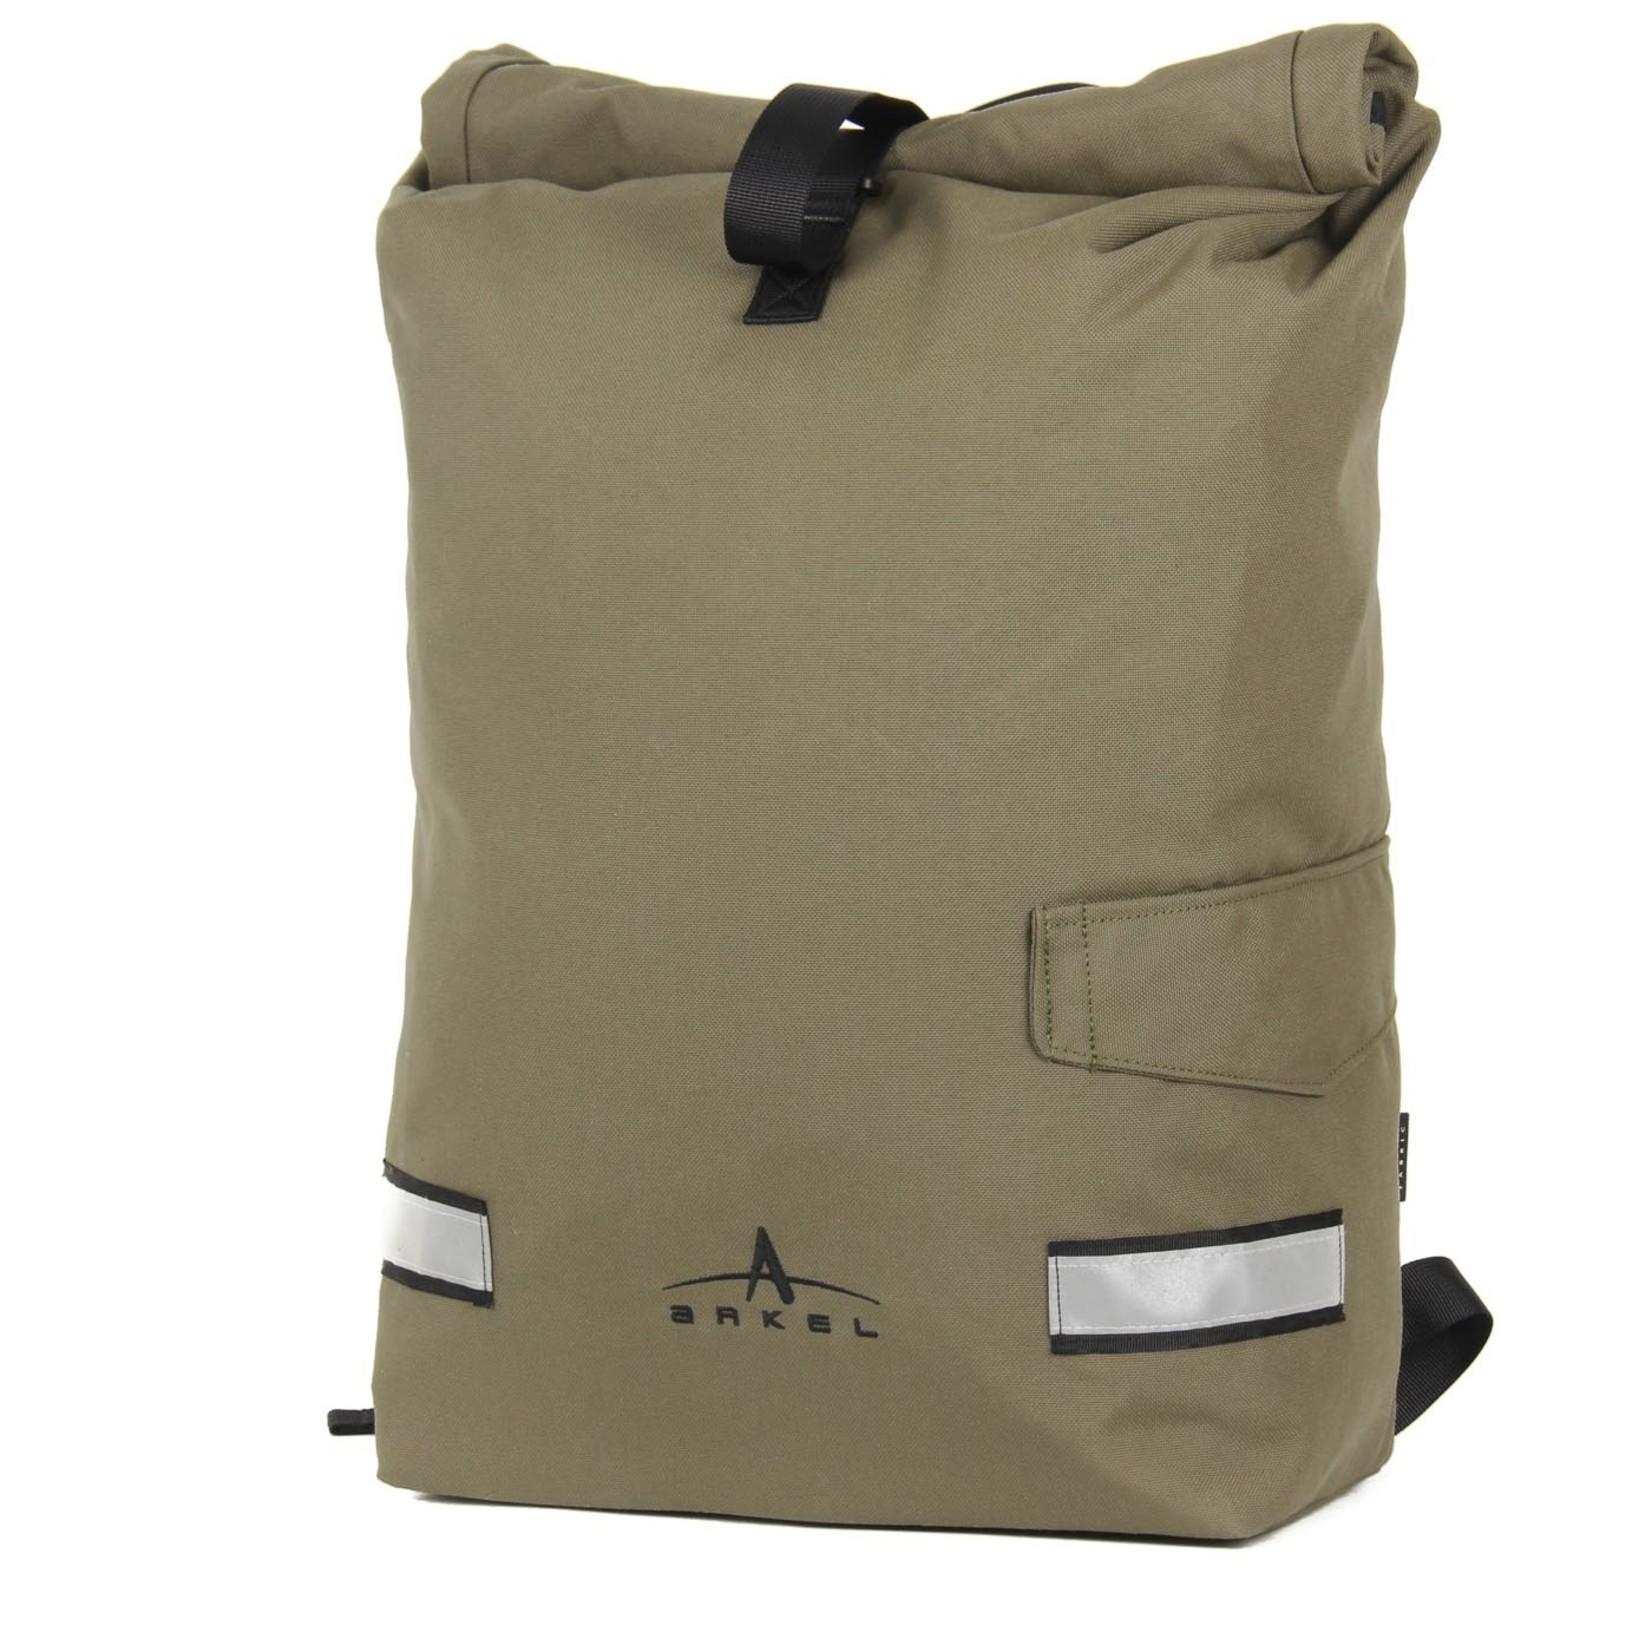 Arkel Arkel Signature D Backpack